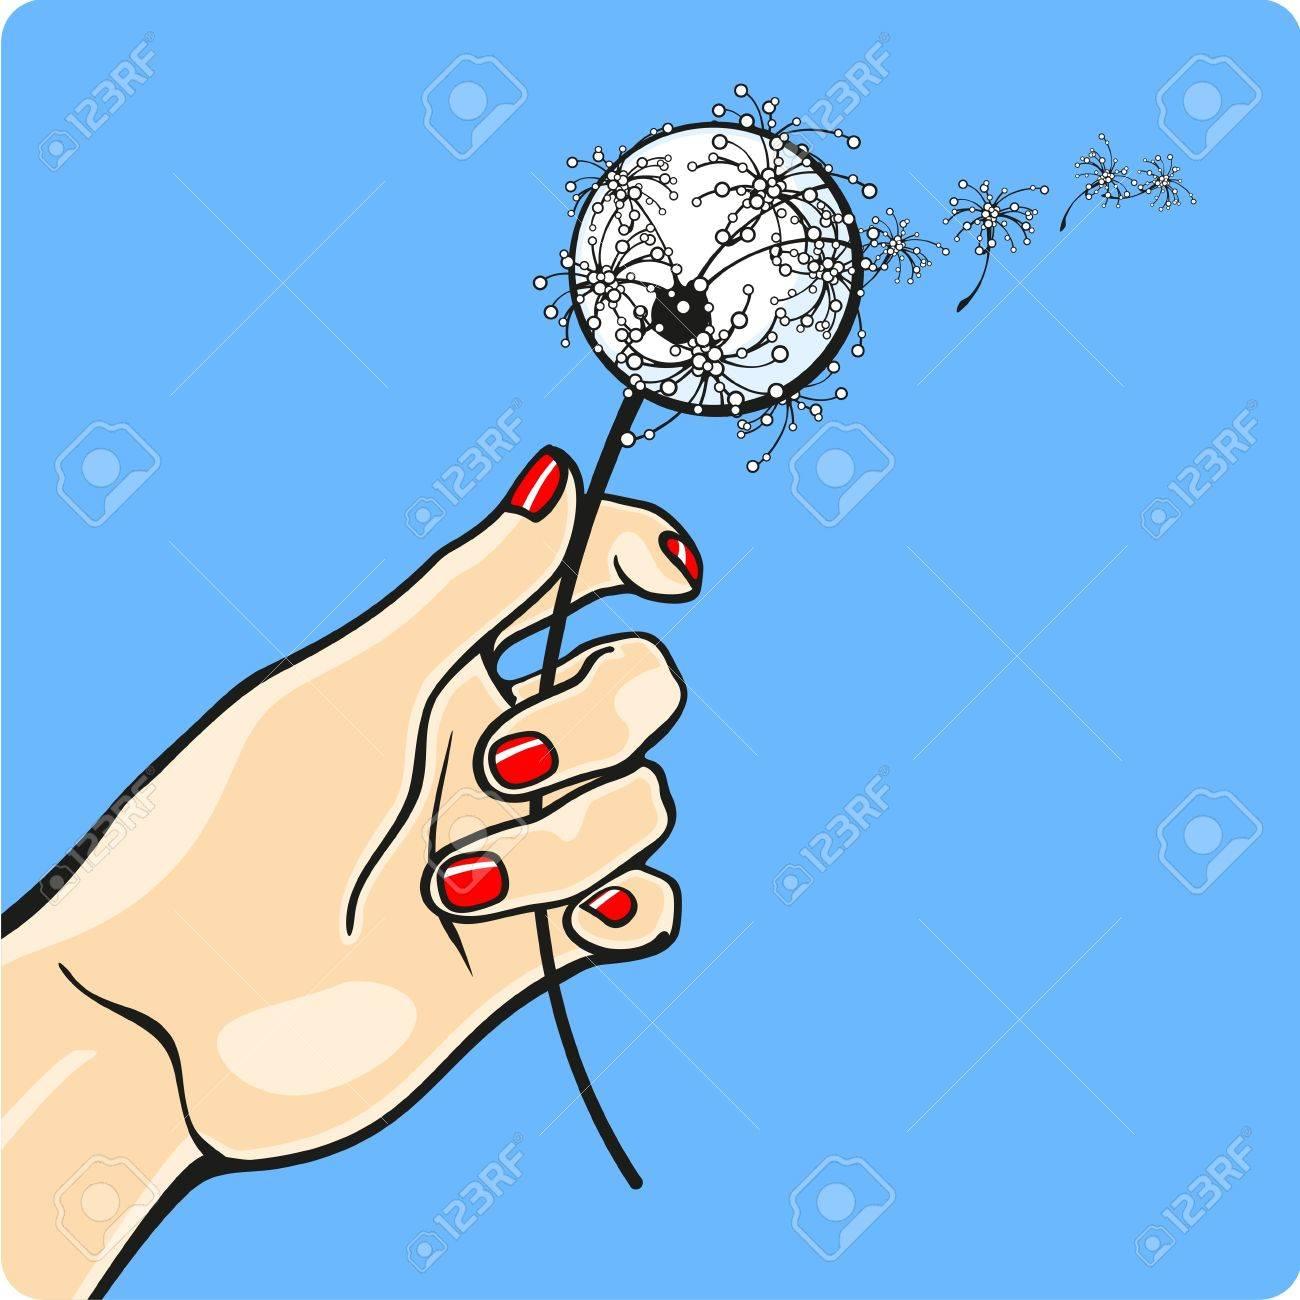 Female hand holding a dandelion Stock Vector - 13607775